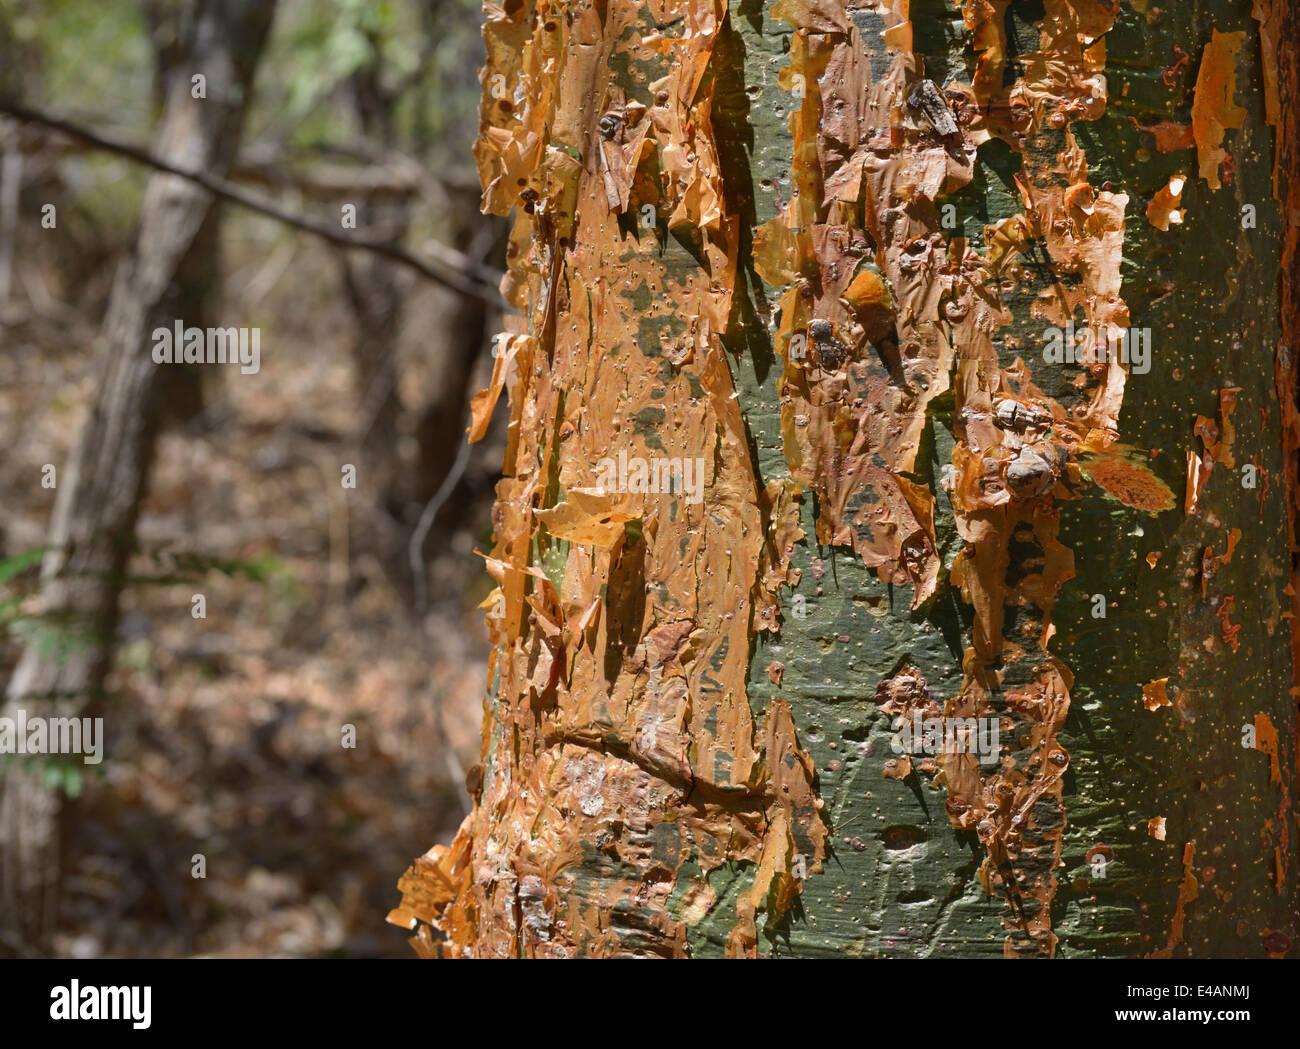 Gumbo-limbo tree, Bursera simaruba, Santa Rosa National Park, Guanacaste Province, Costa Rica - Stock Image